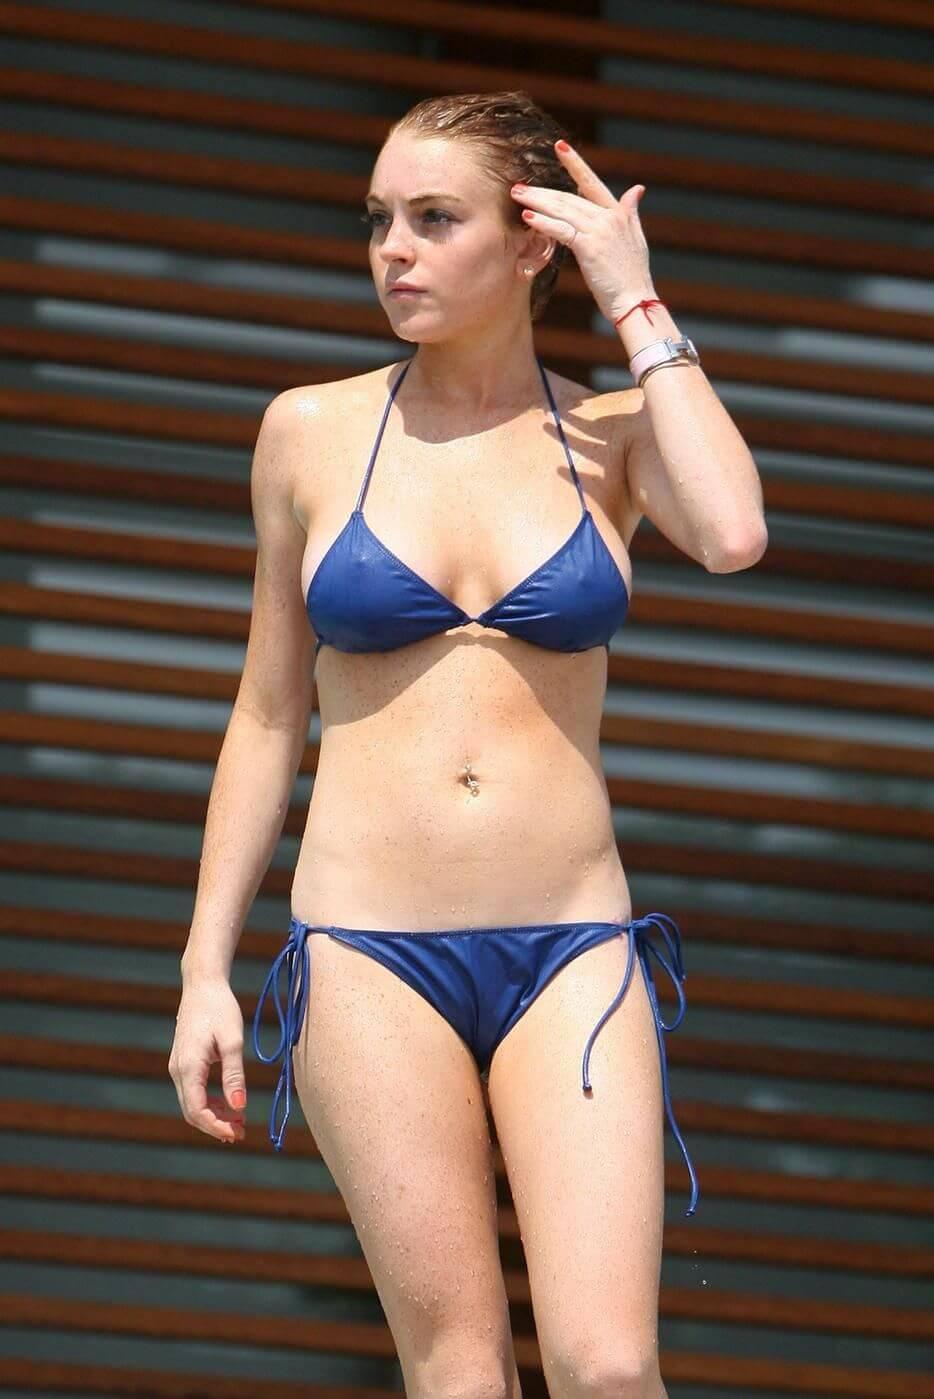 Lindsay Lohan sexy lingerie pics